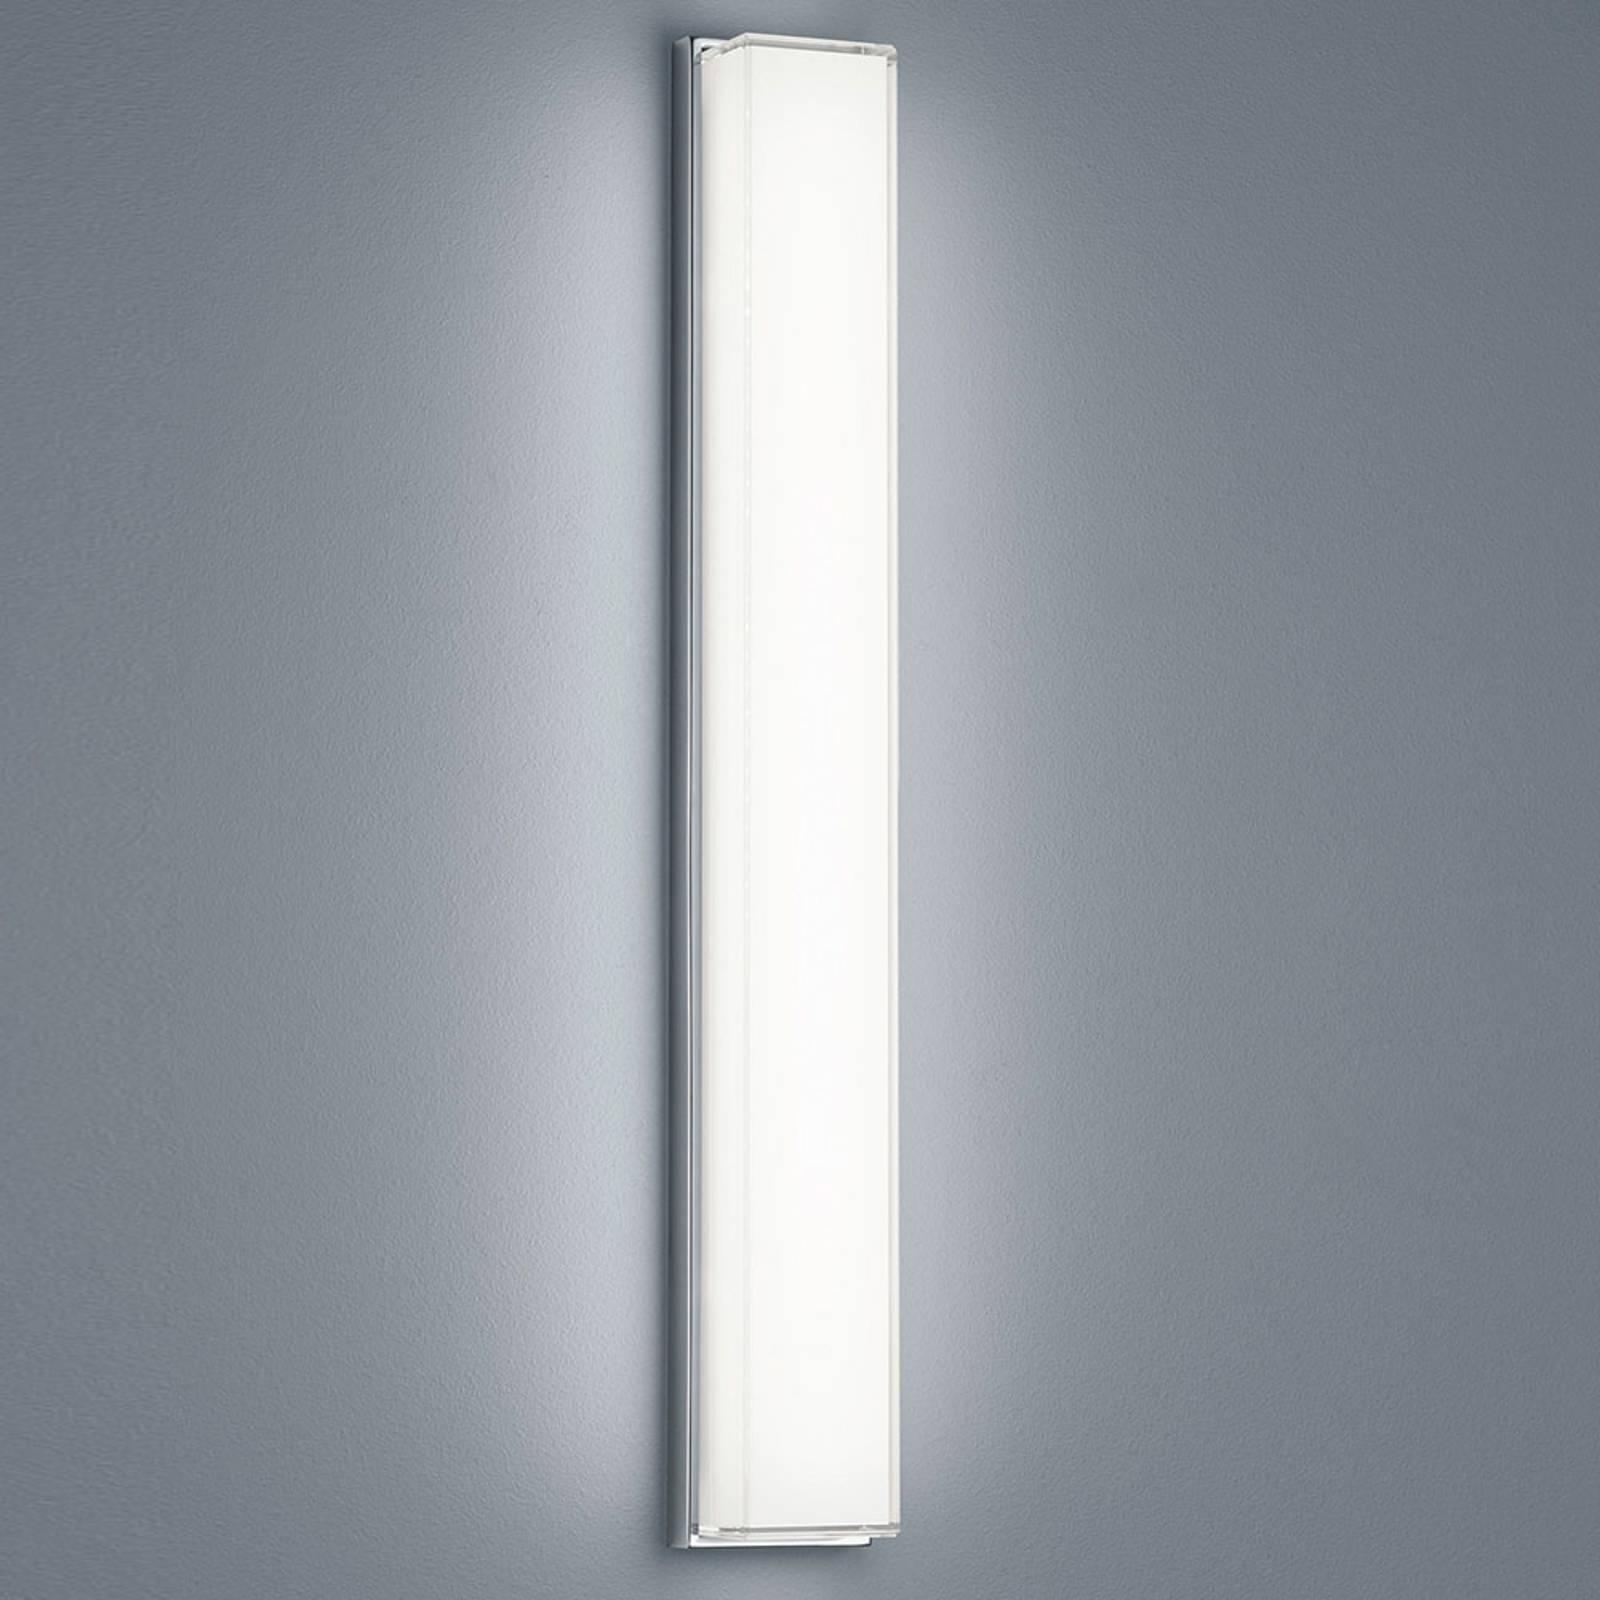 Helestra Cosi -LED-seinävalaisin kromi, K 61 cm